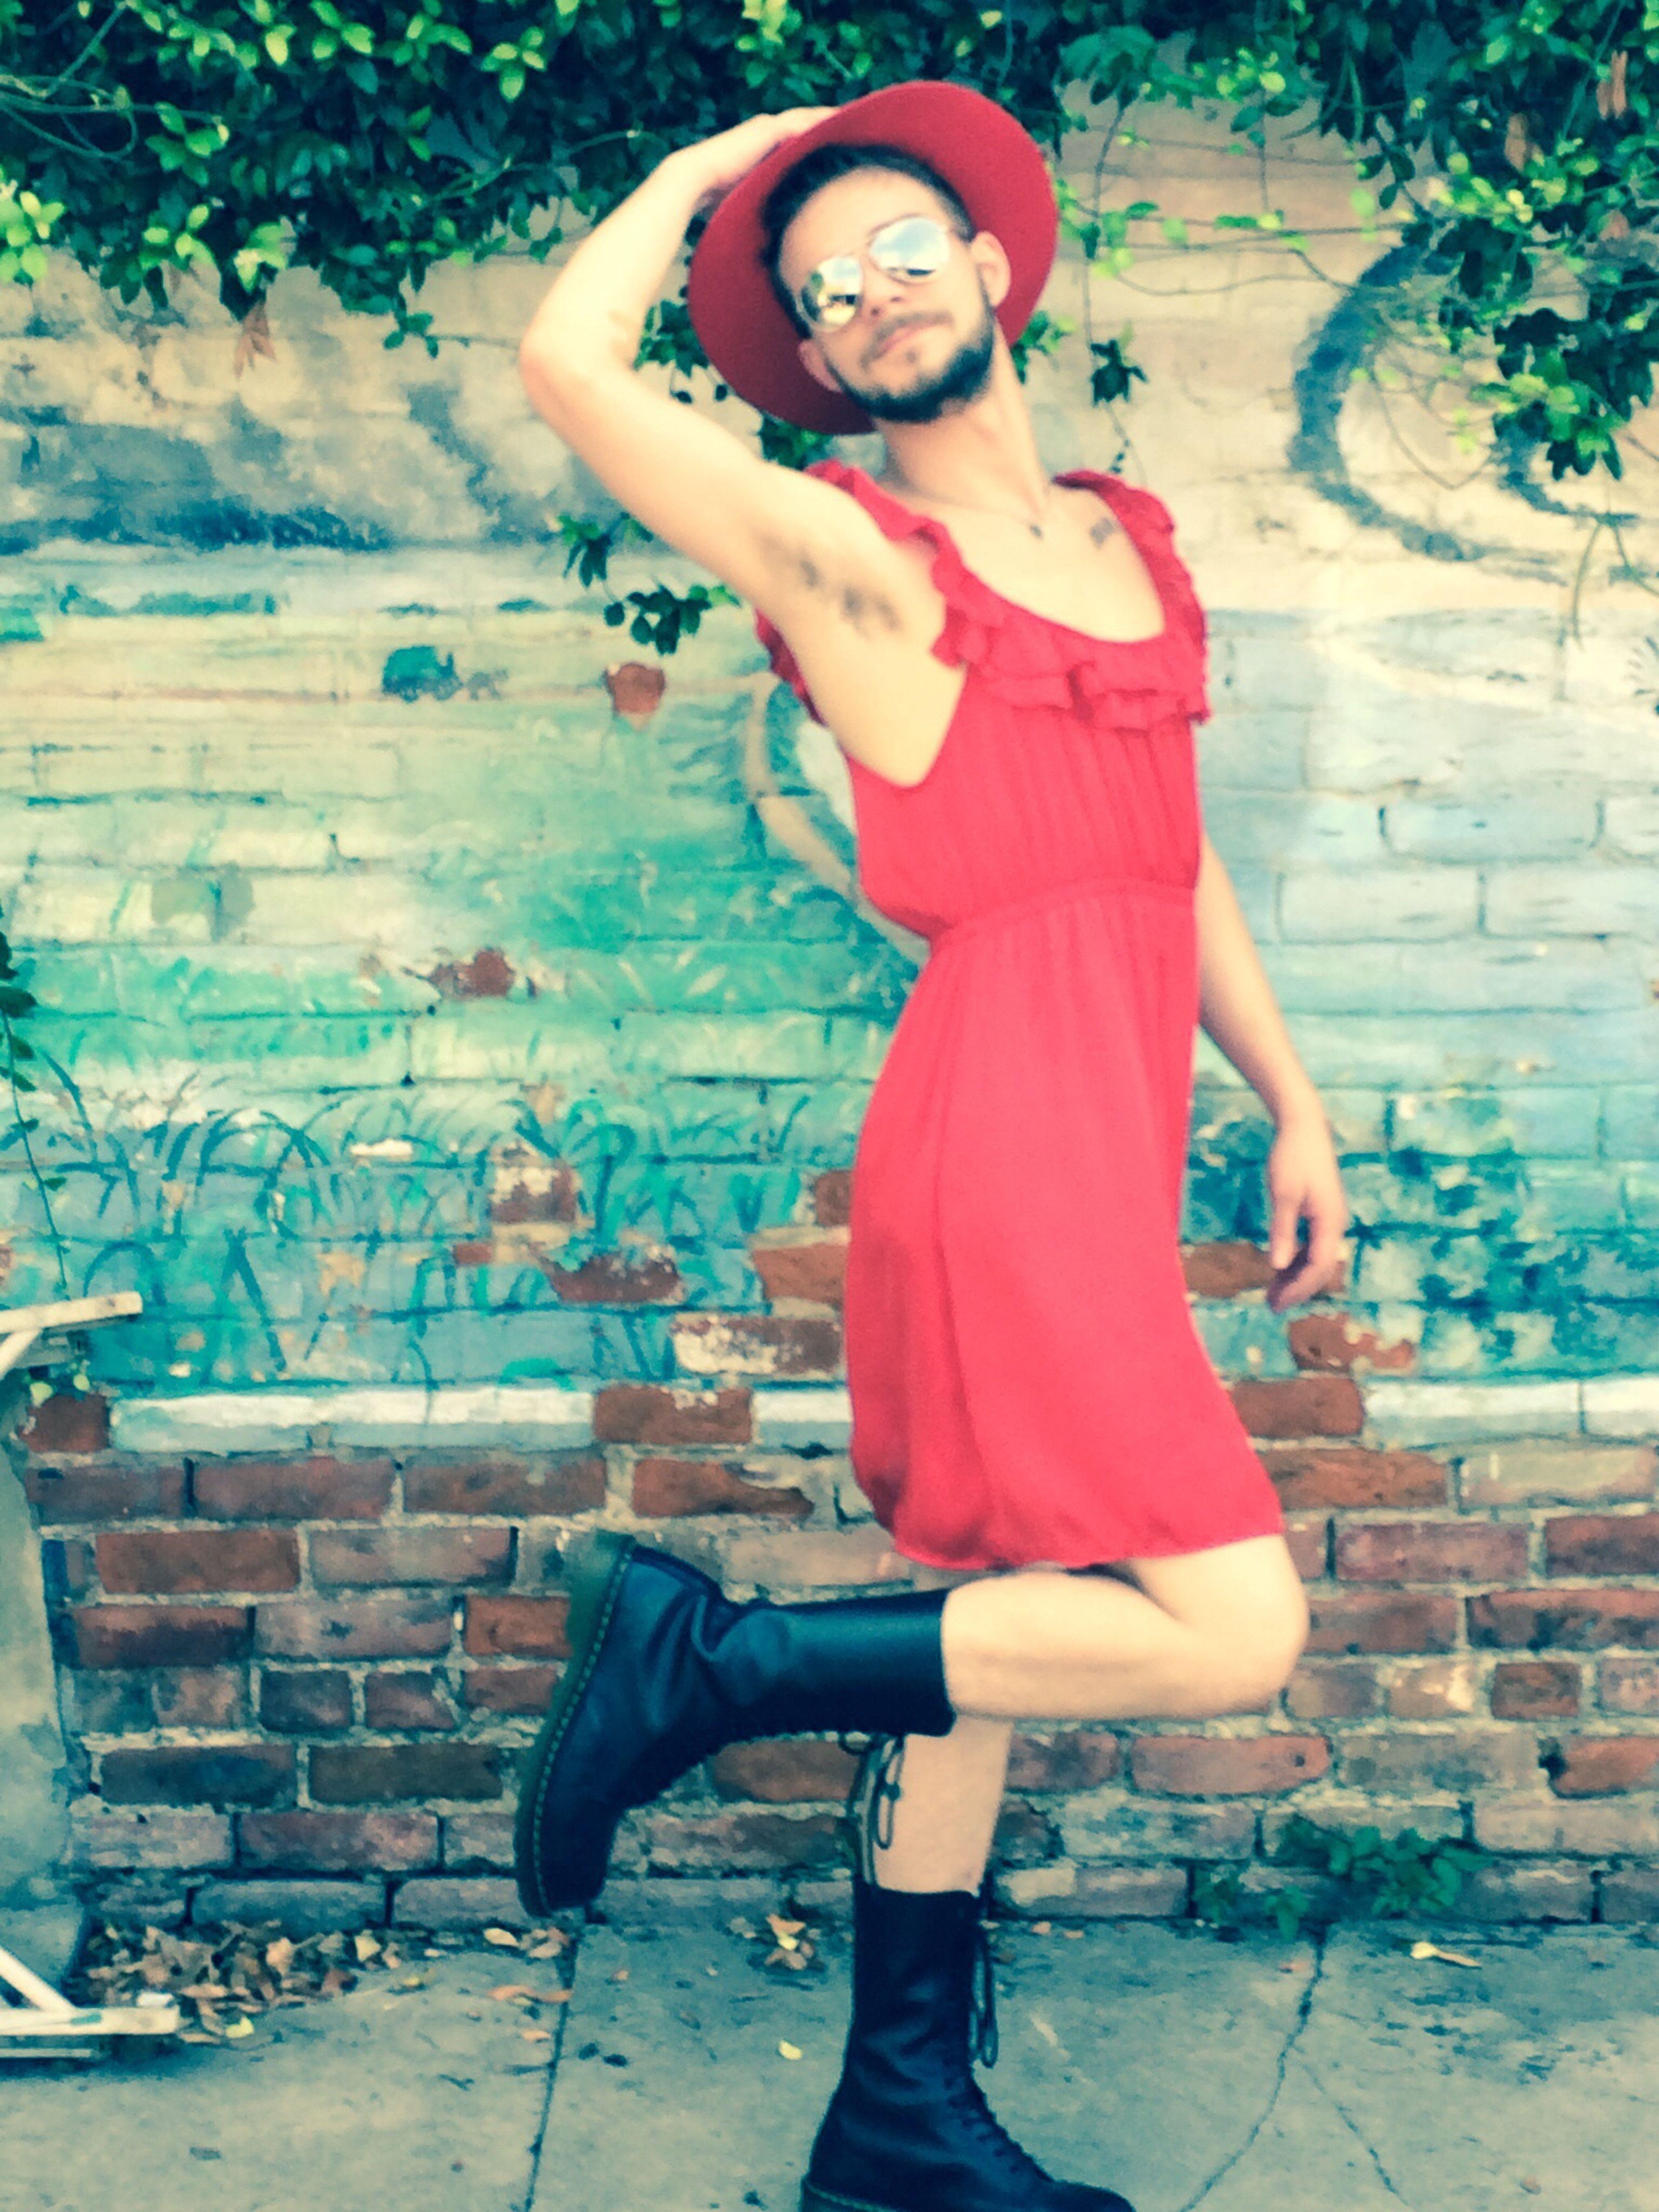 Street Fashion Enjoying Life Red Dress Run Belong Anywhere